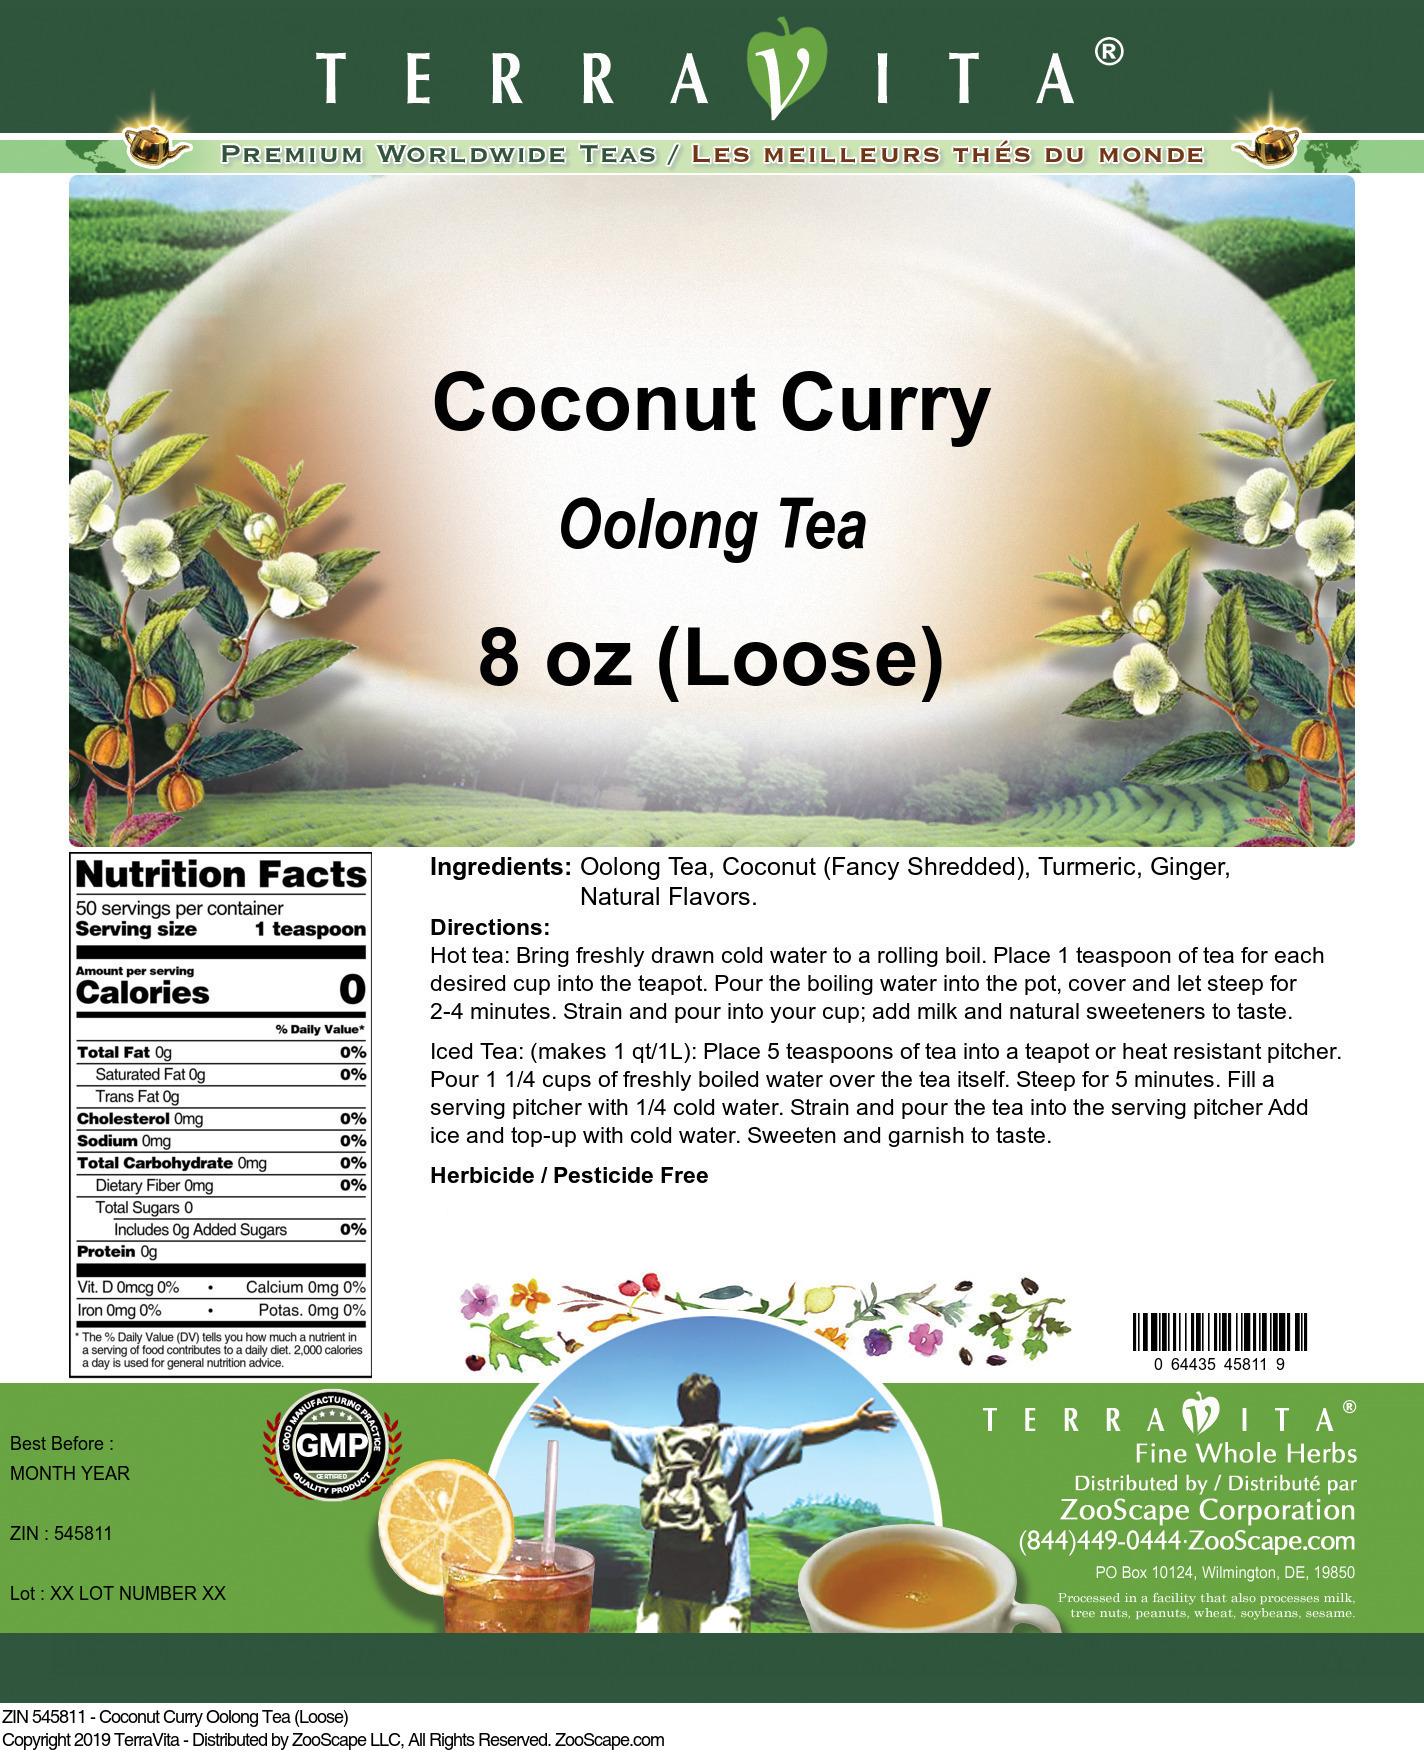 Coconut Curry Oolong Tea